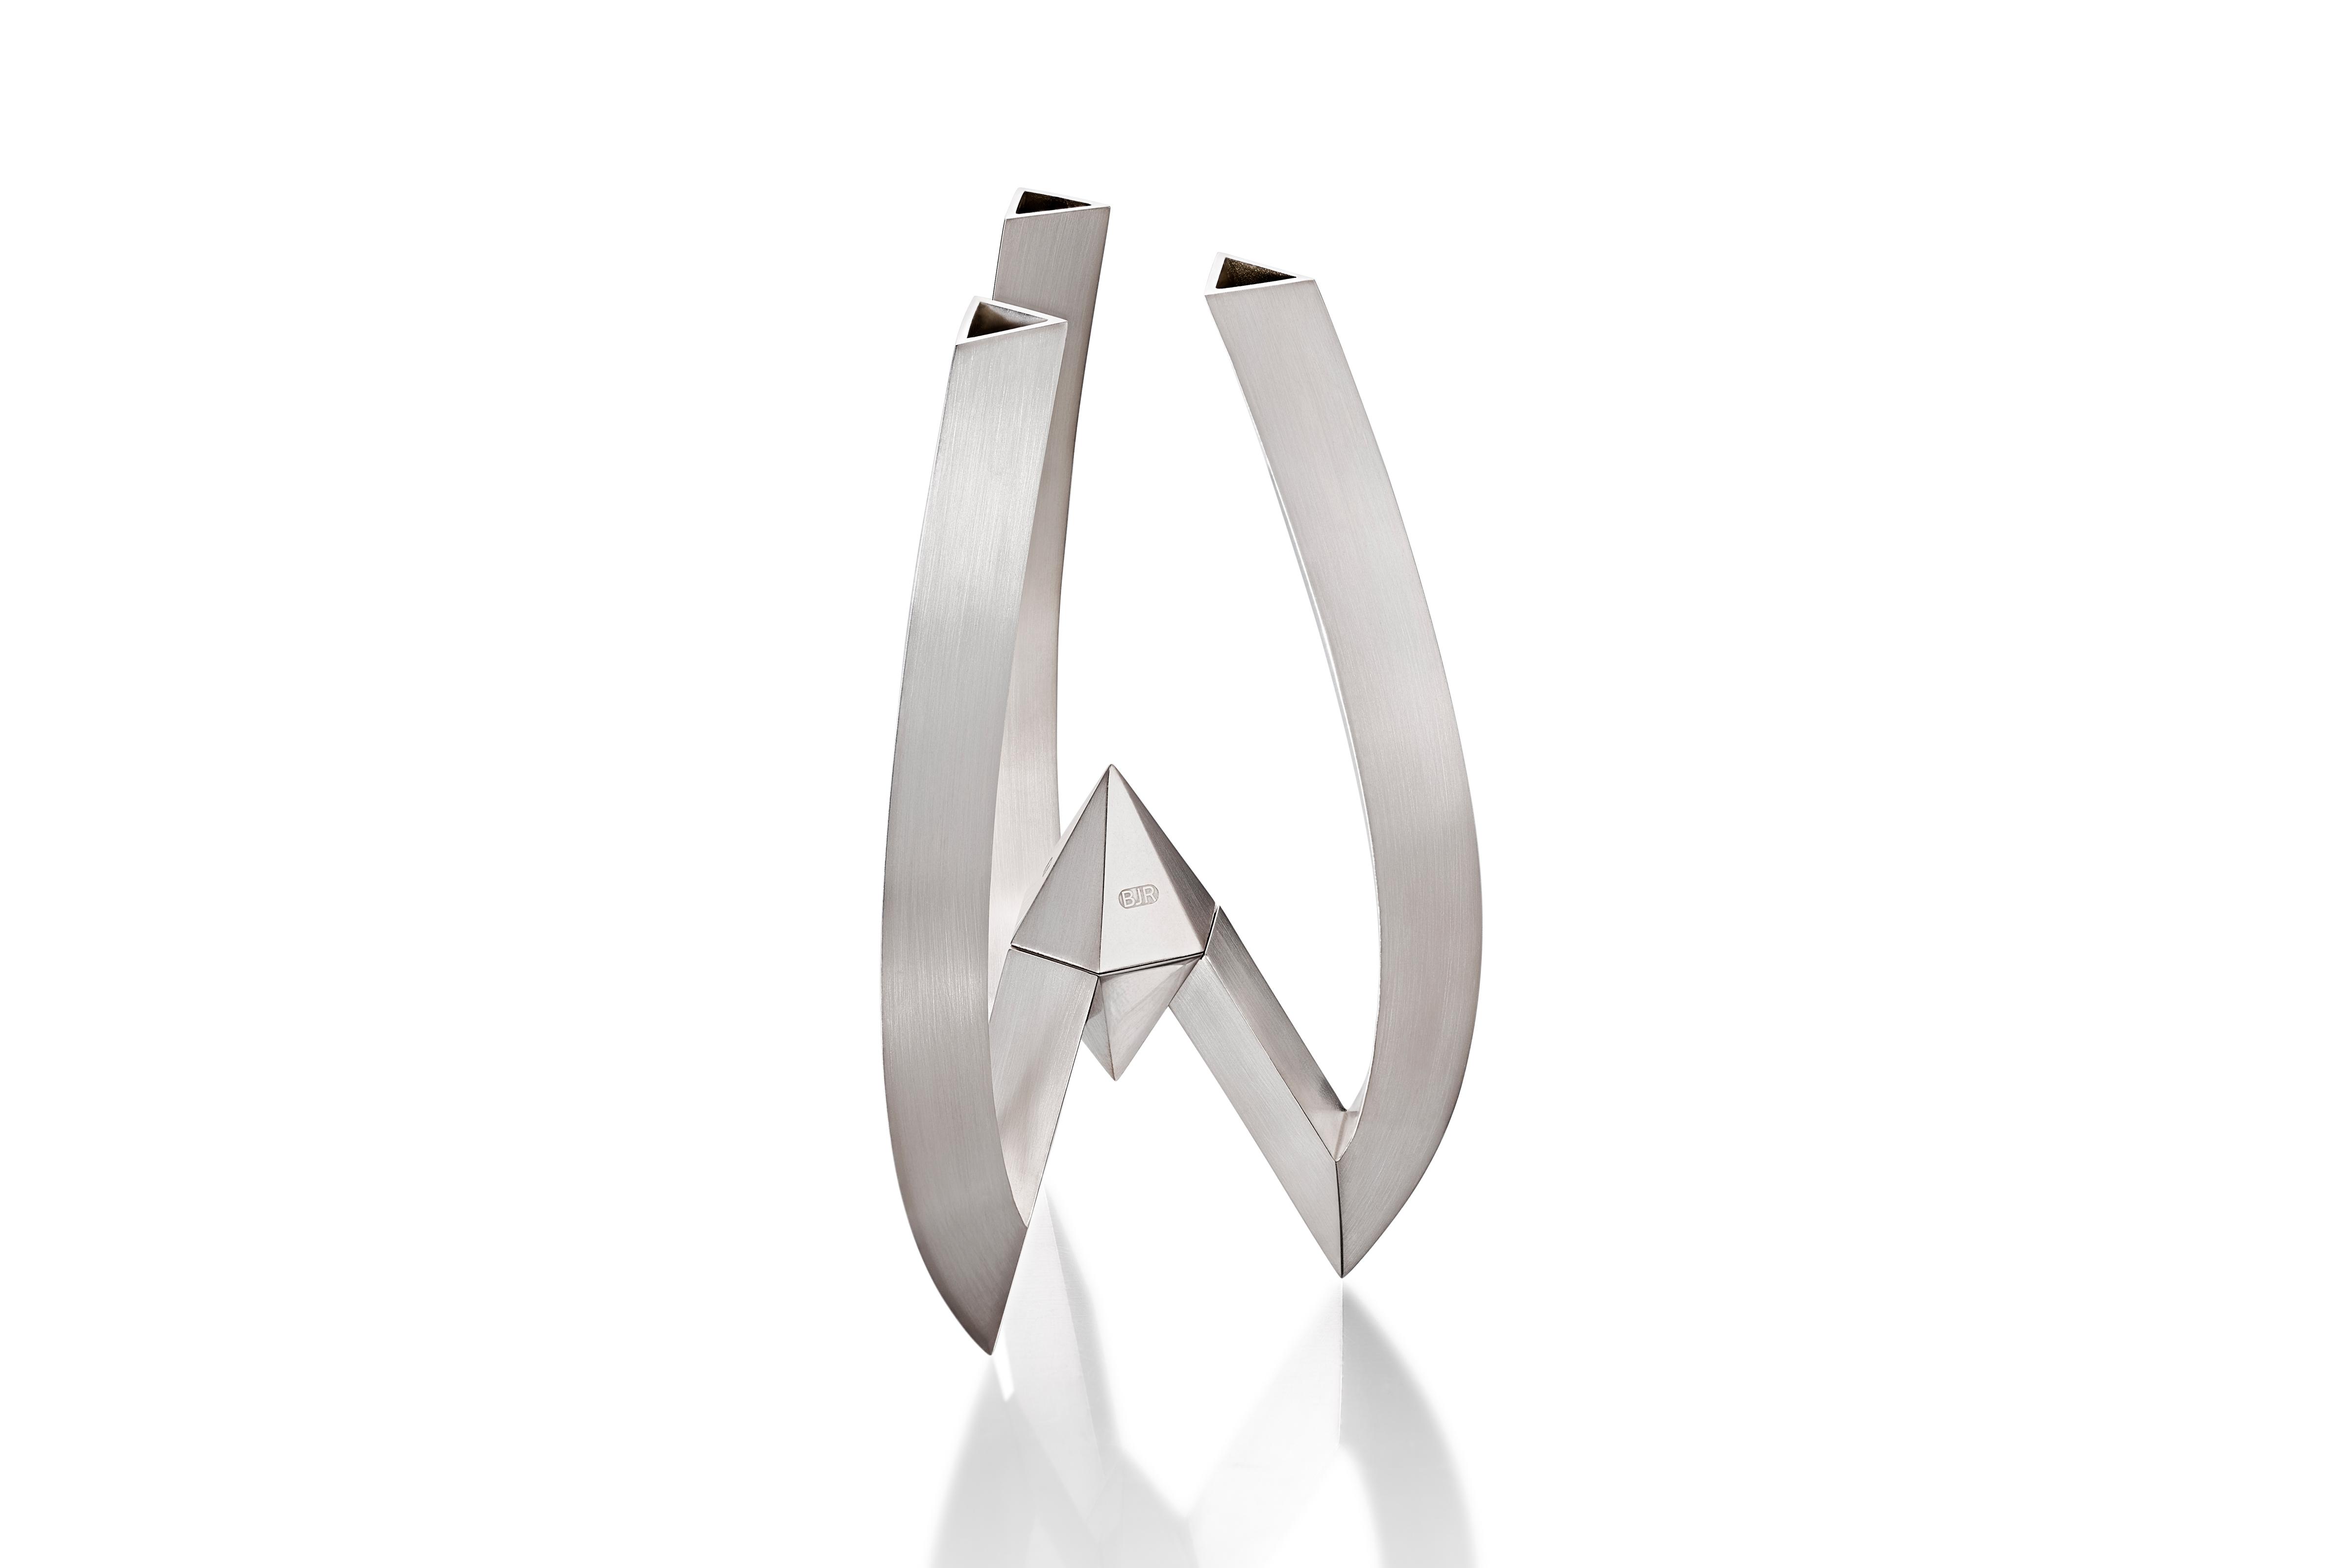 Trio Vita Vase – Perspective – Copyright BJRdesigns